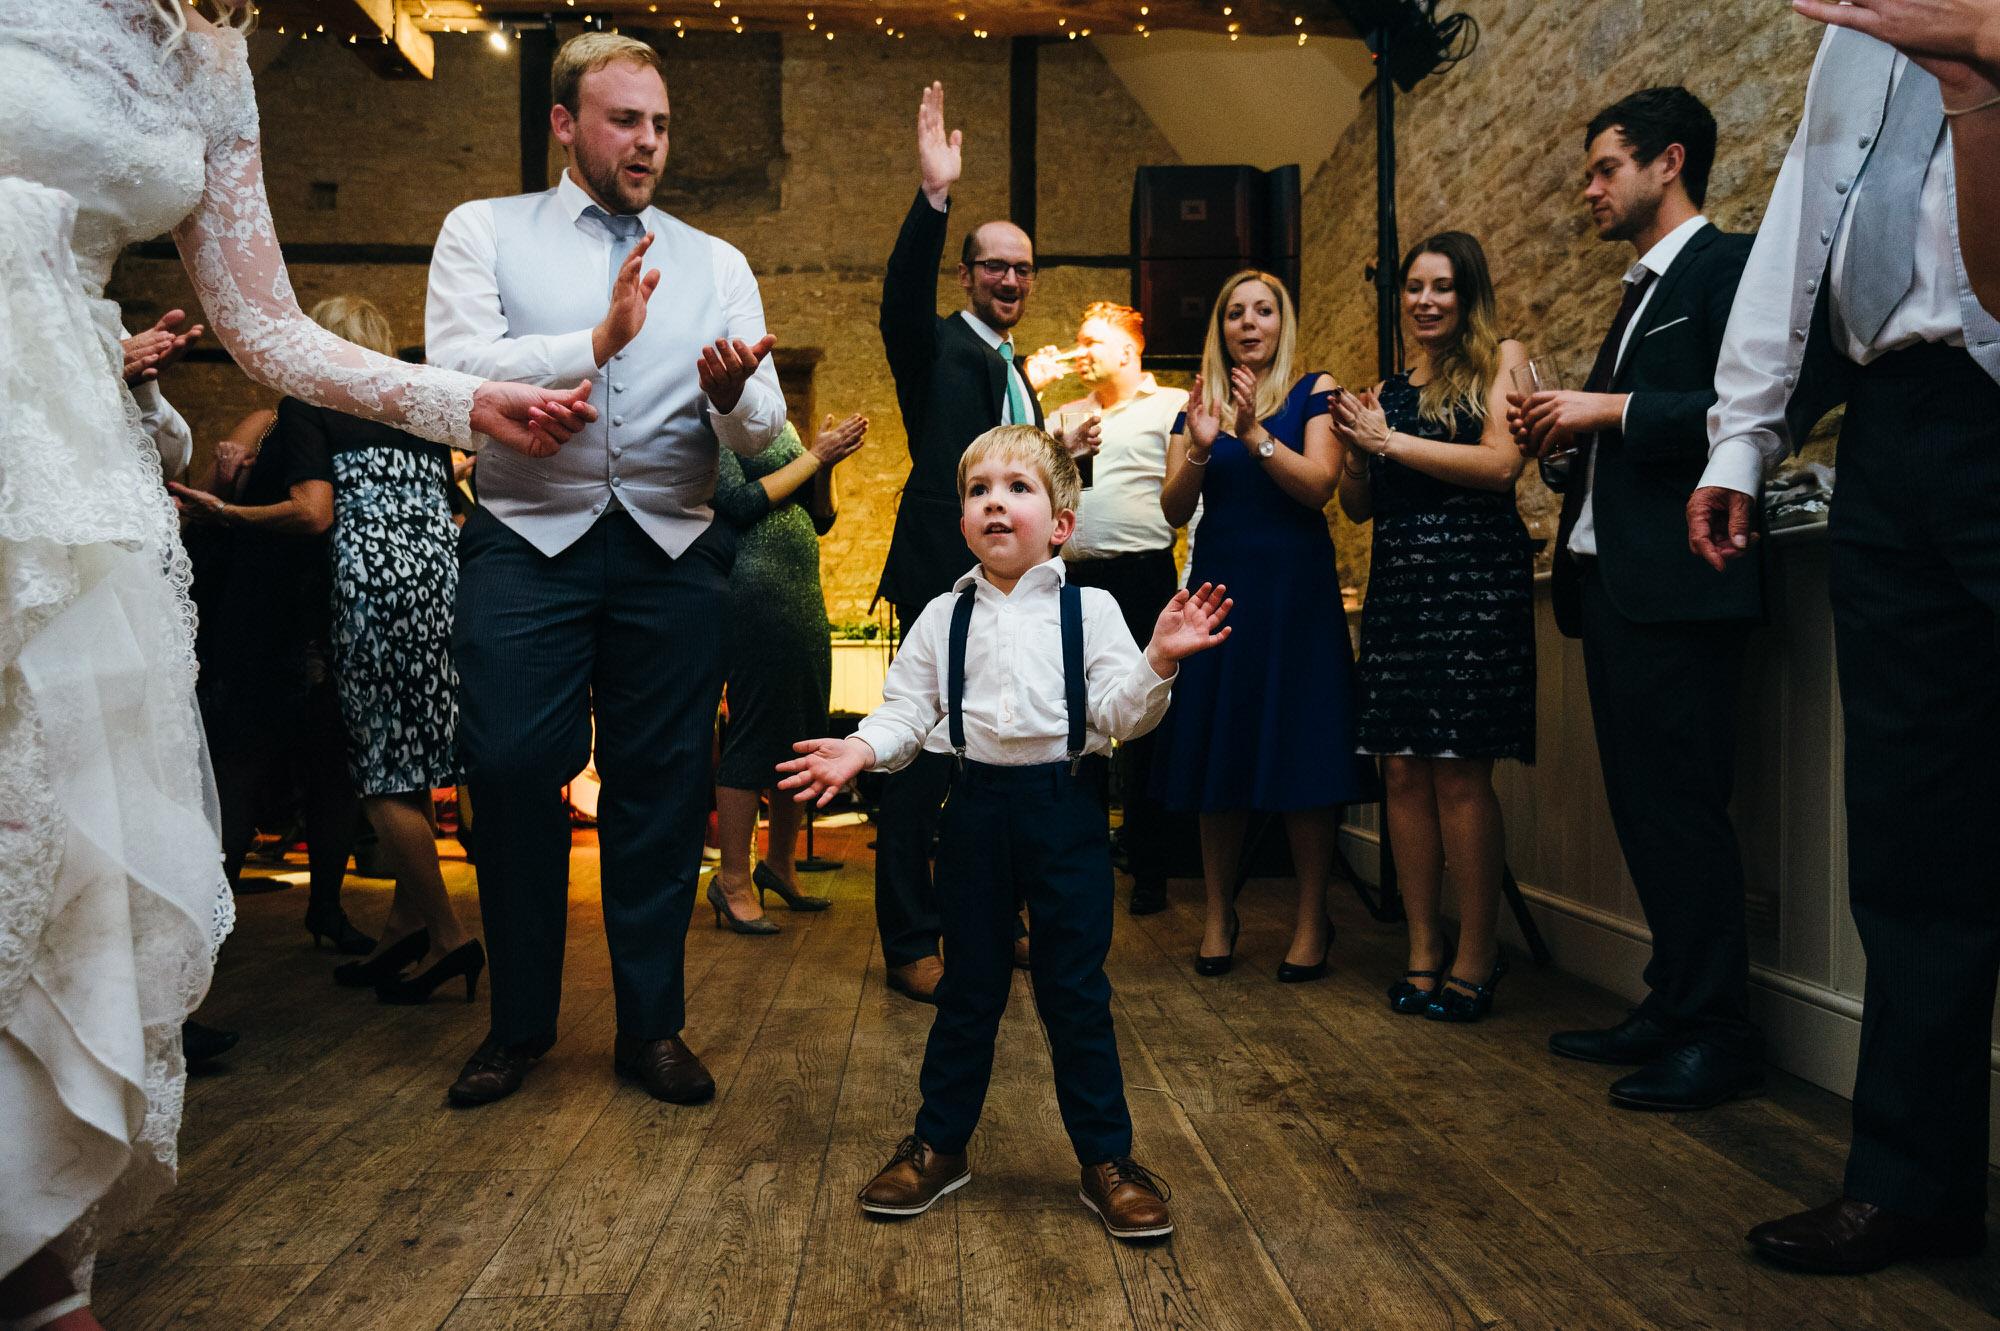 Wick farm wedding dance floor